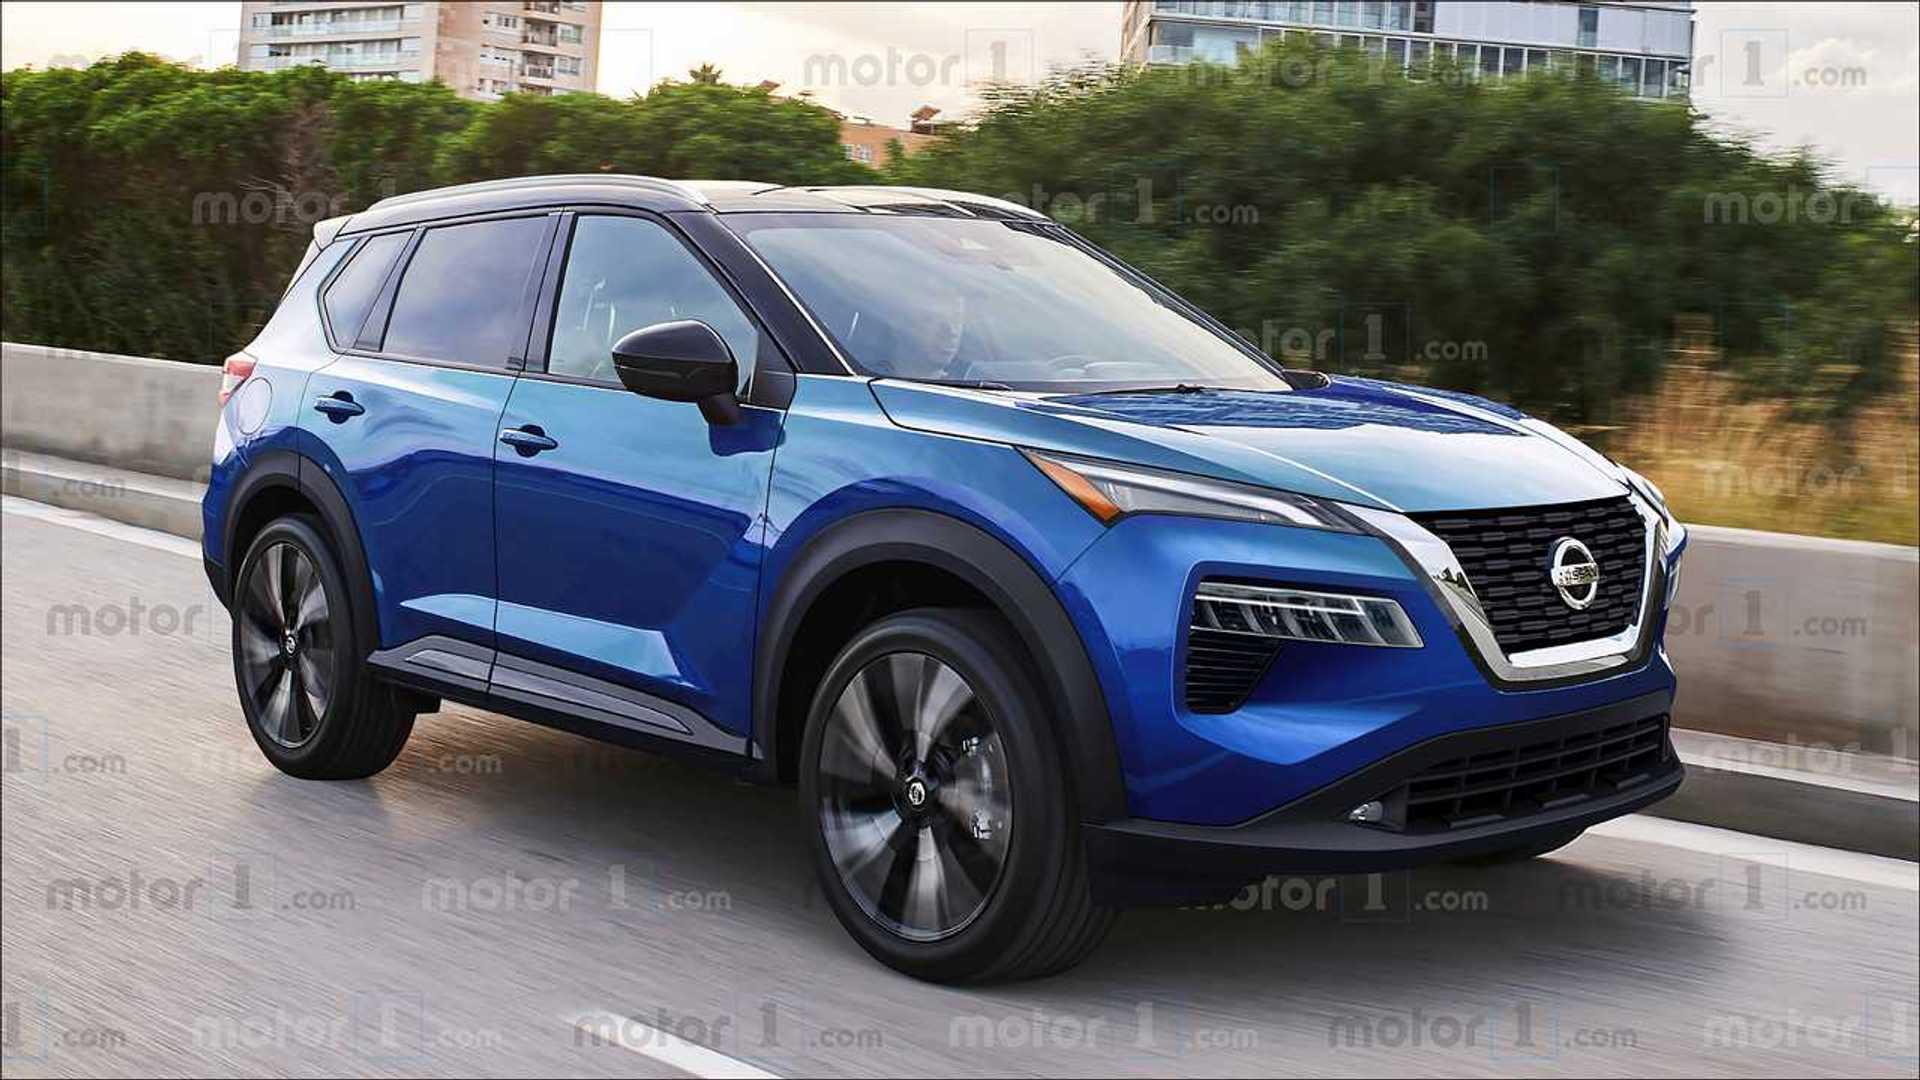 2021 Nissan X-Trail / Rogue 39